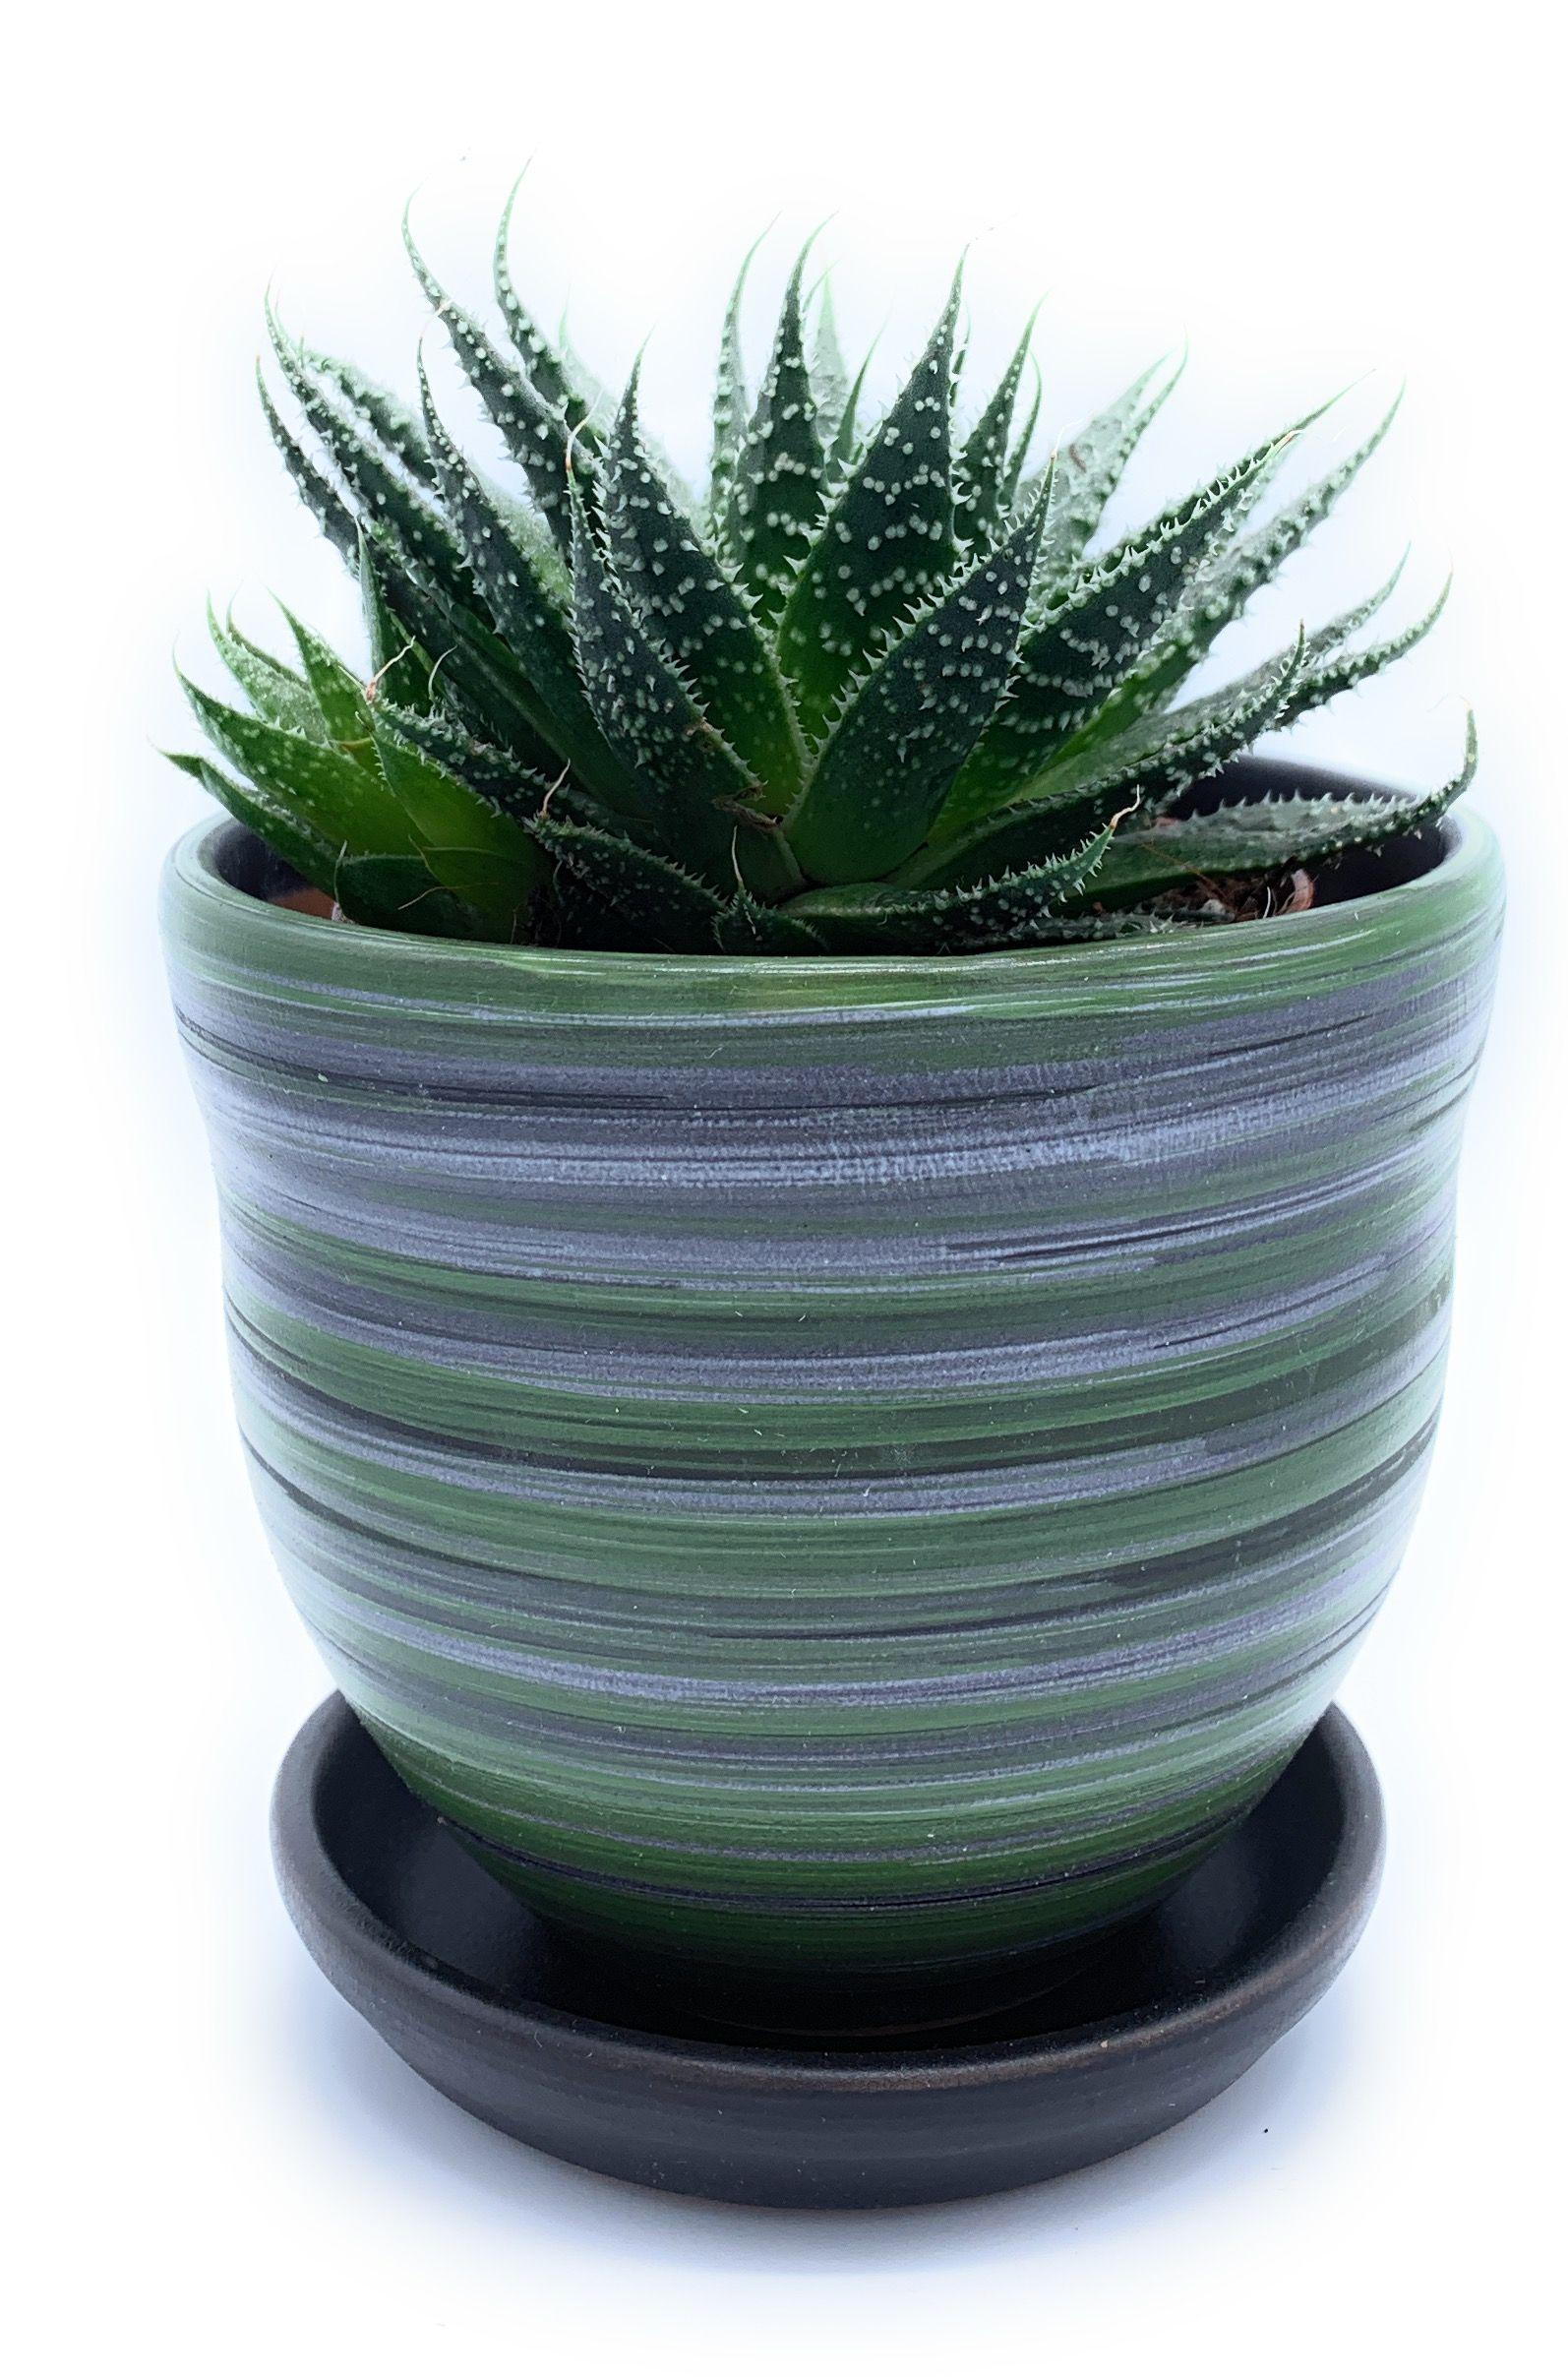 Glazed Ceramic Flower Pot With Saucer Matt Black White Green Round